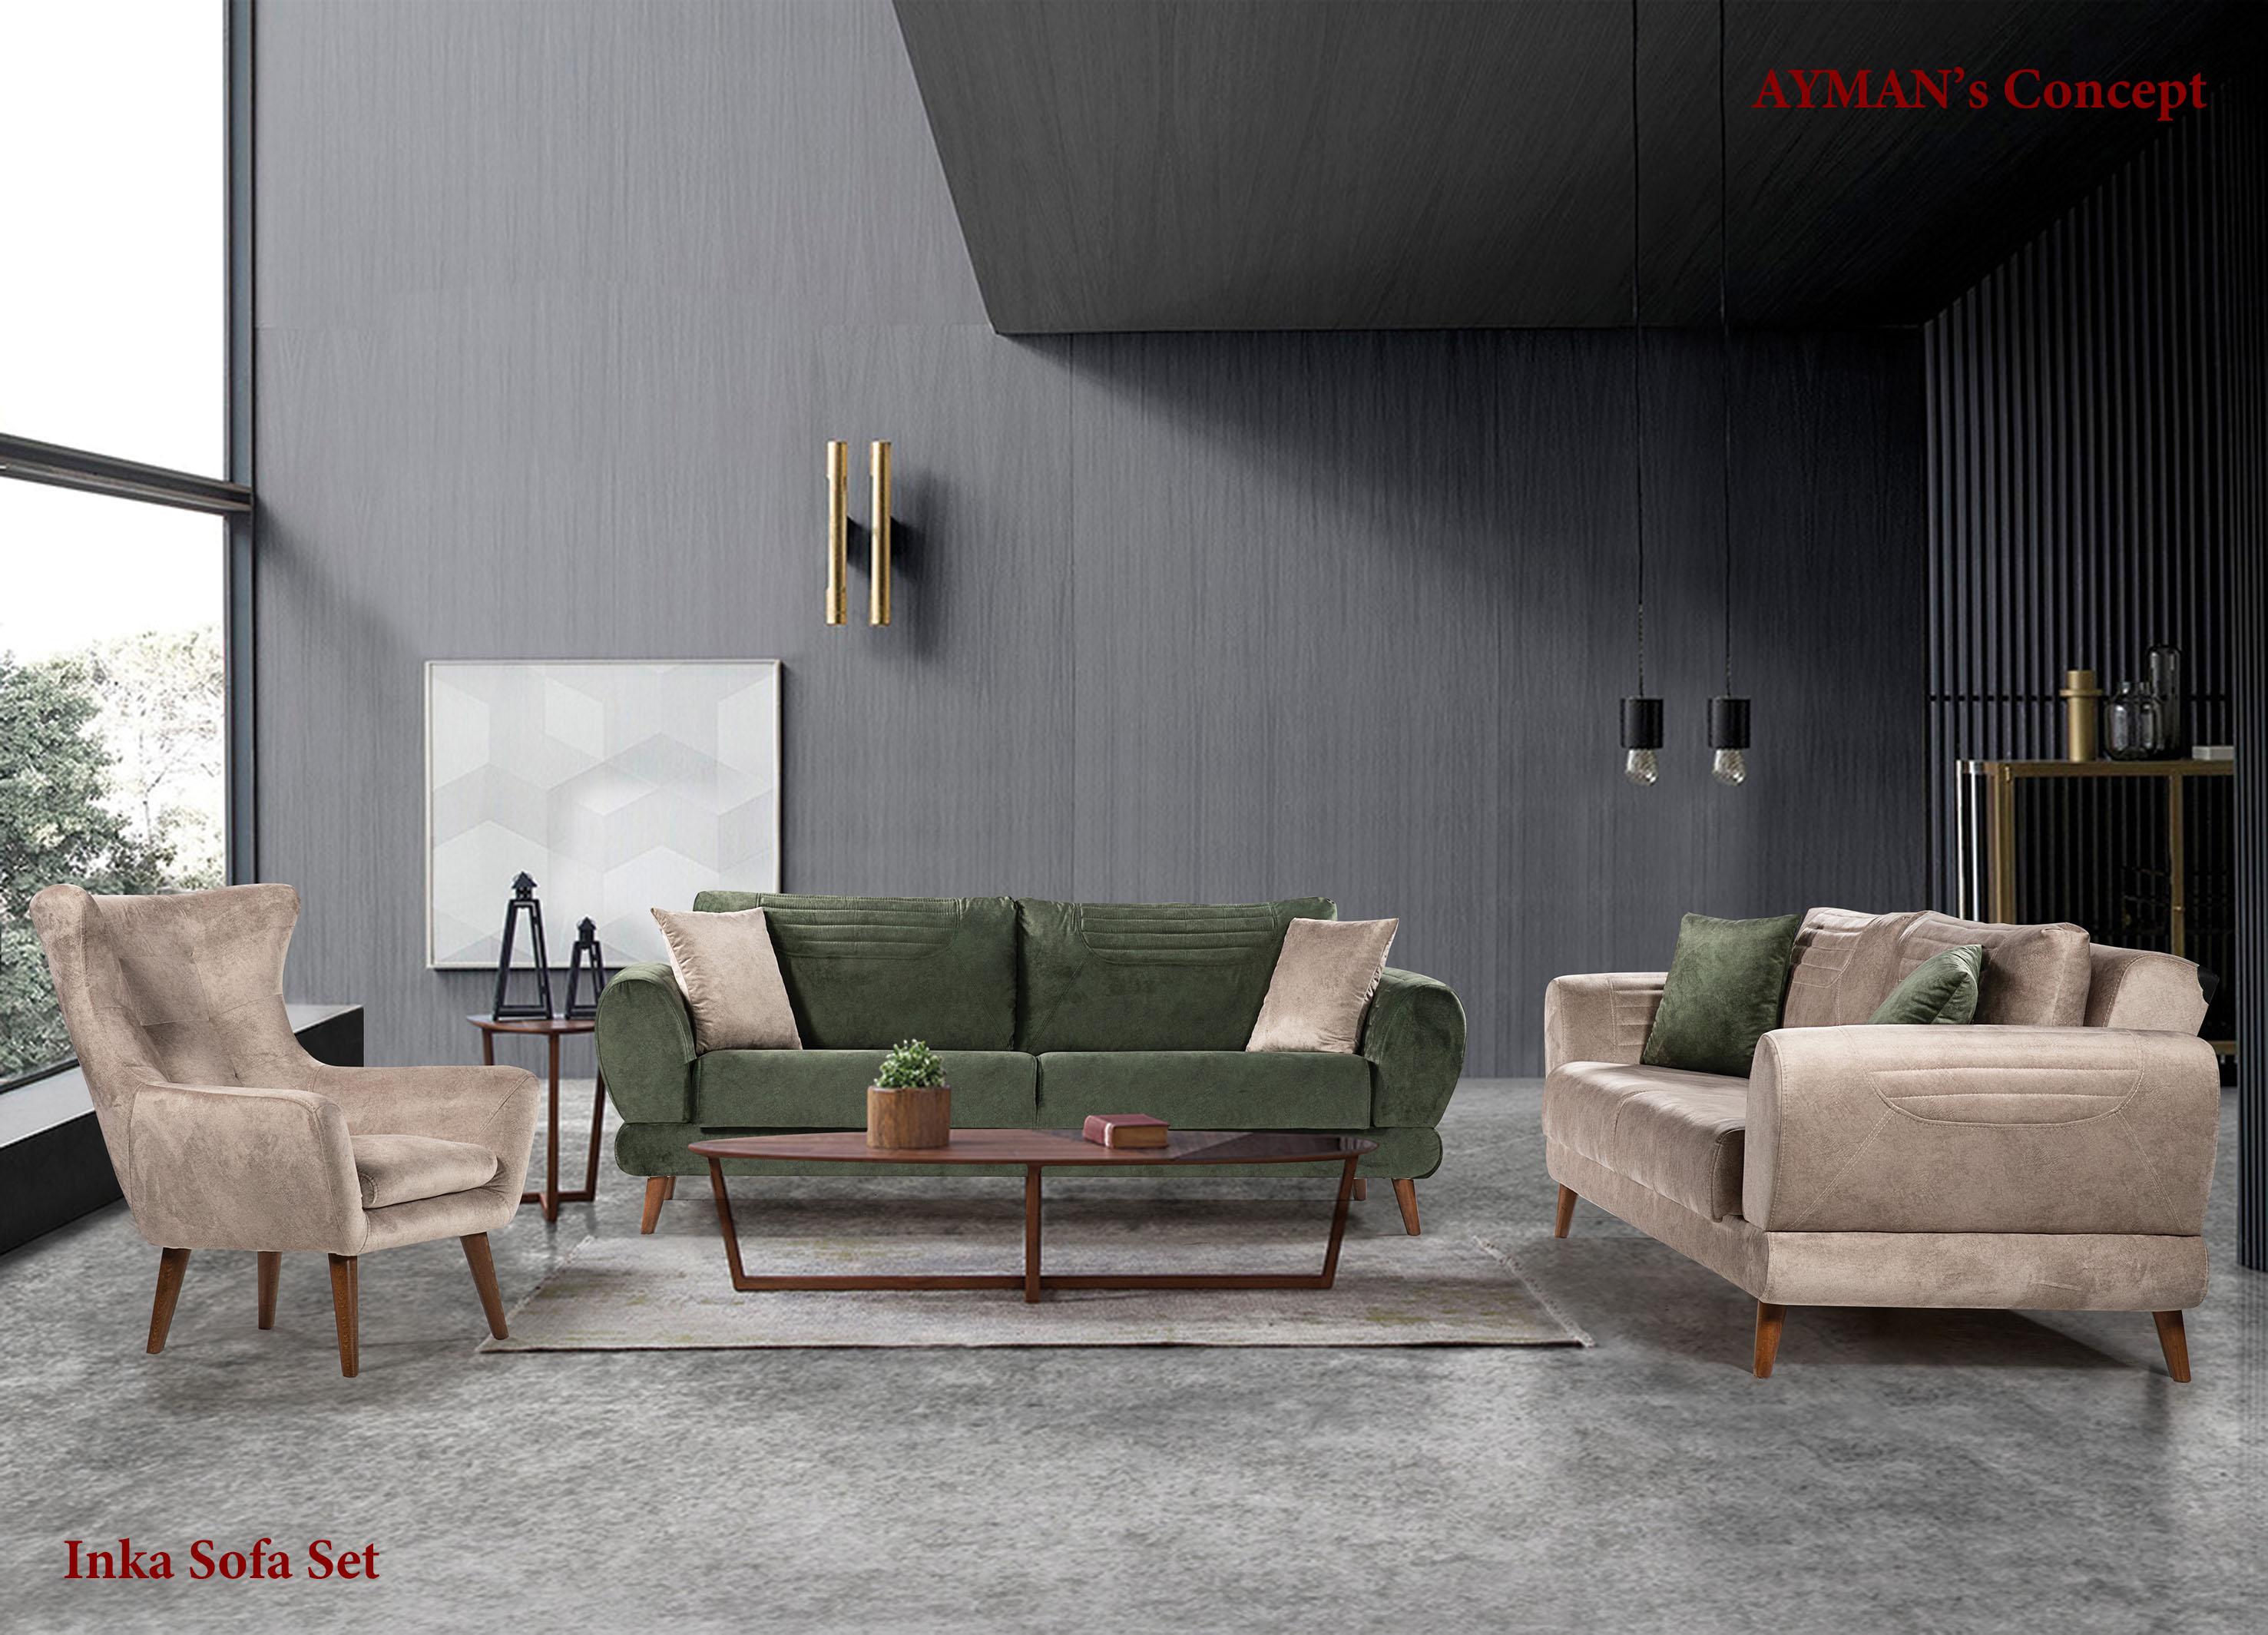 Inka Sofa Set